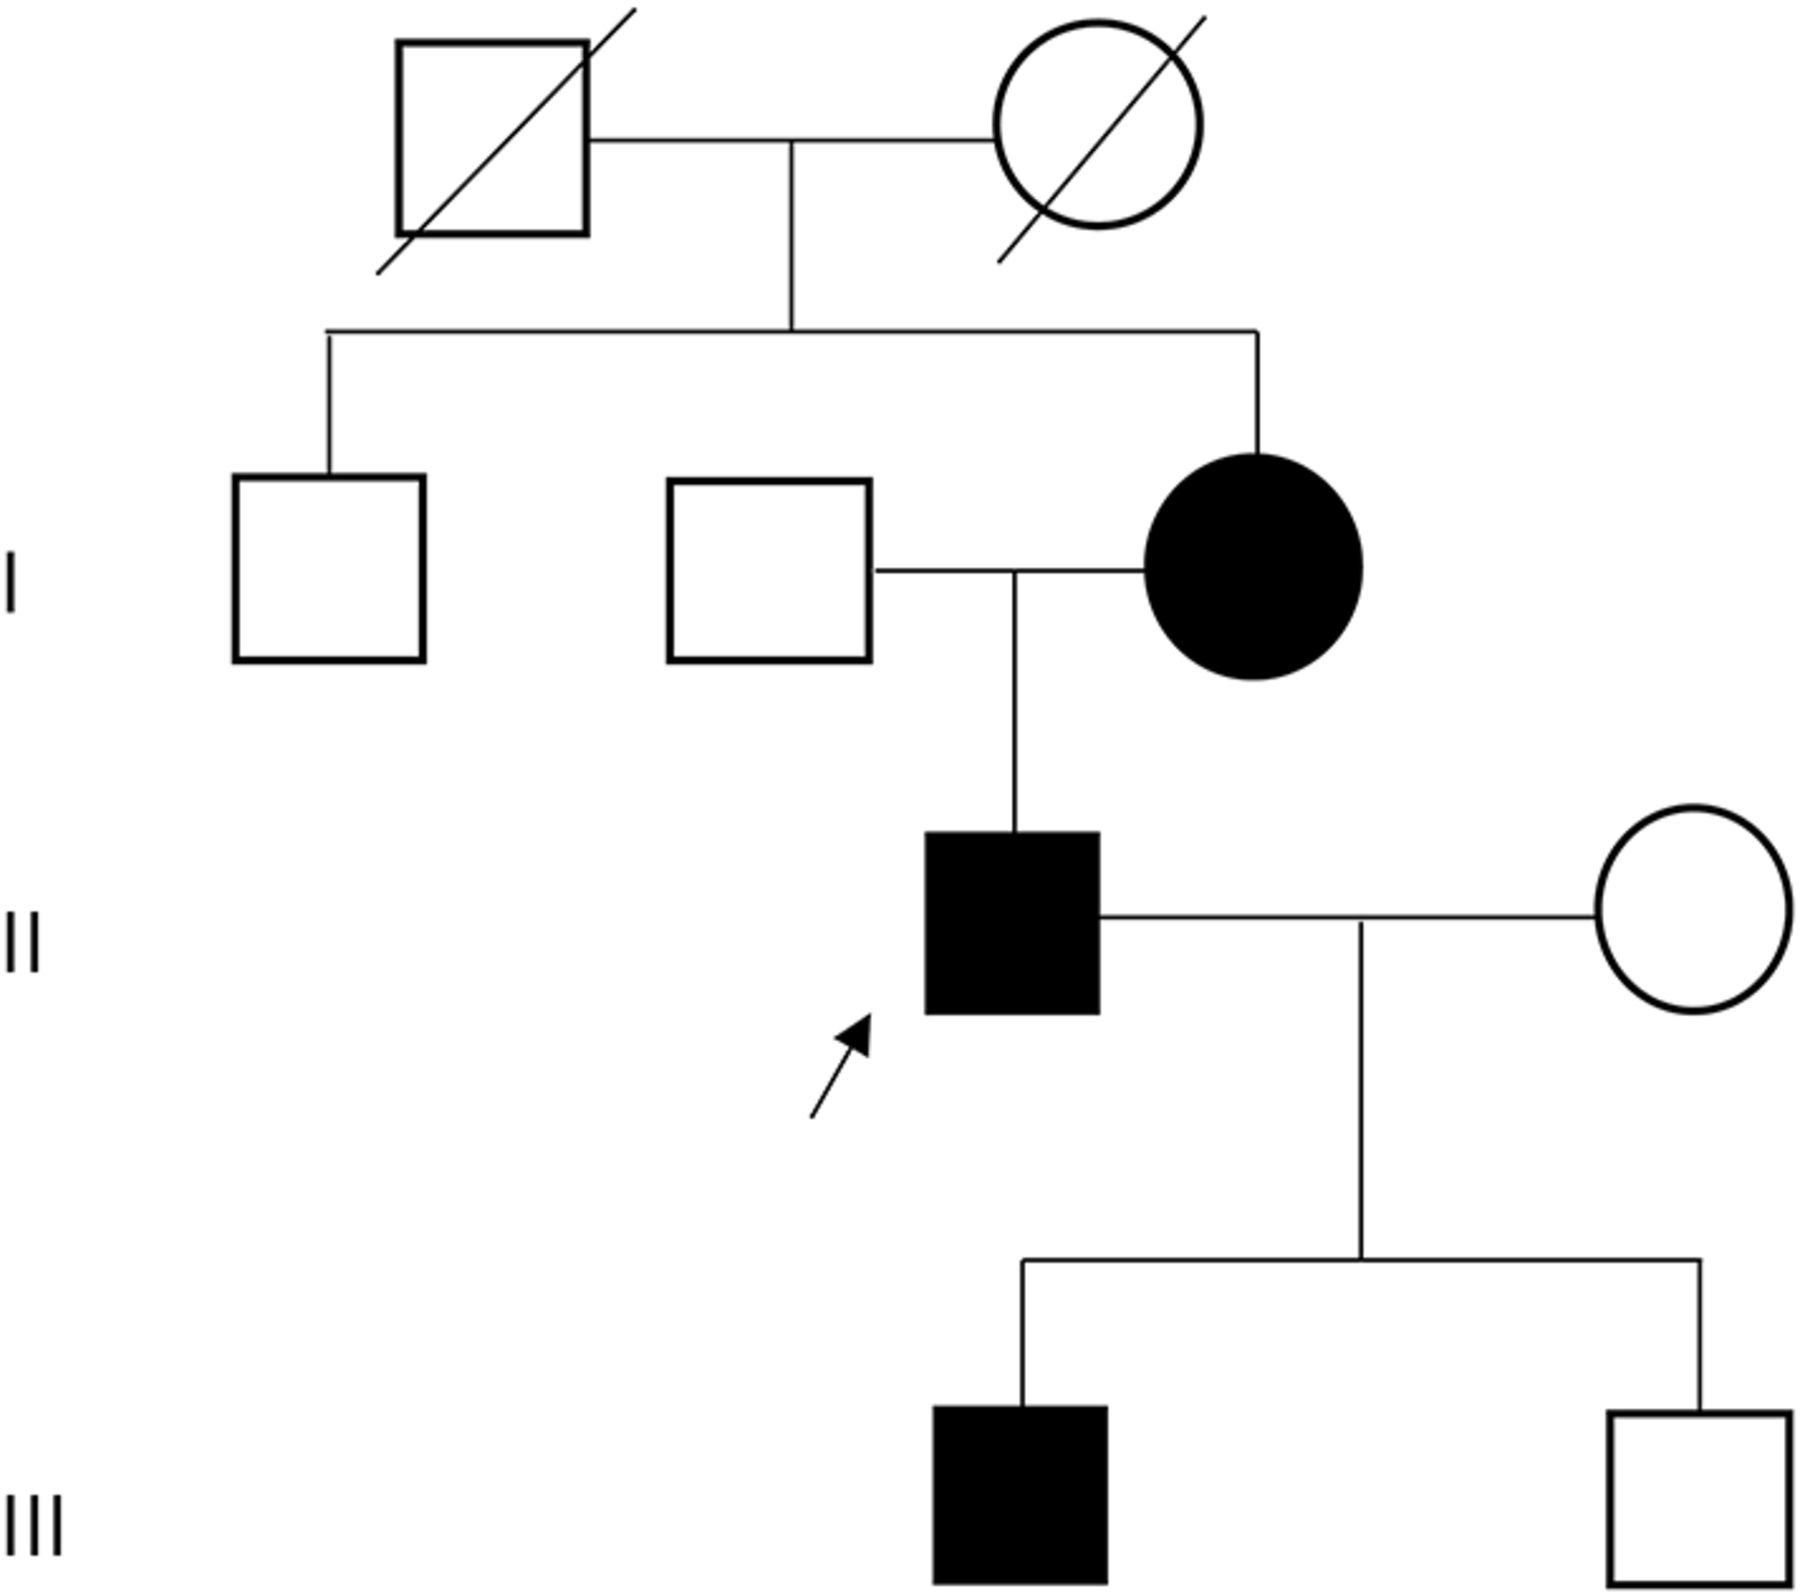 Novel mutation in TNPO3 causes congenital limb-girdle